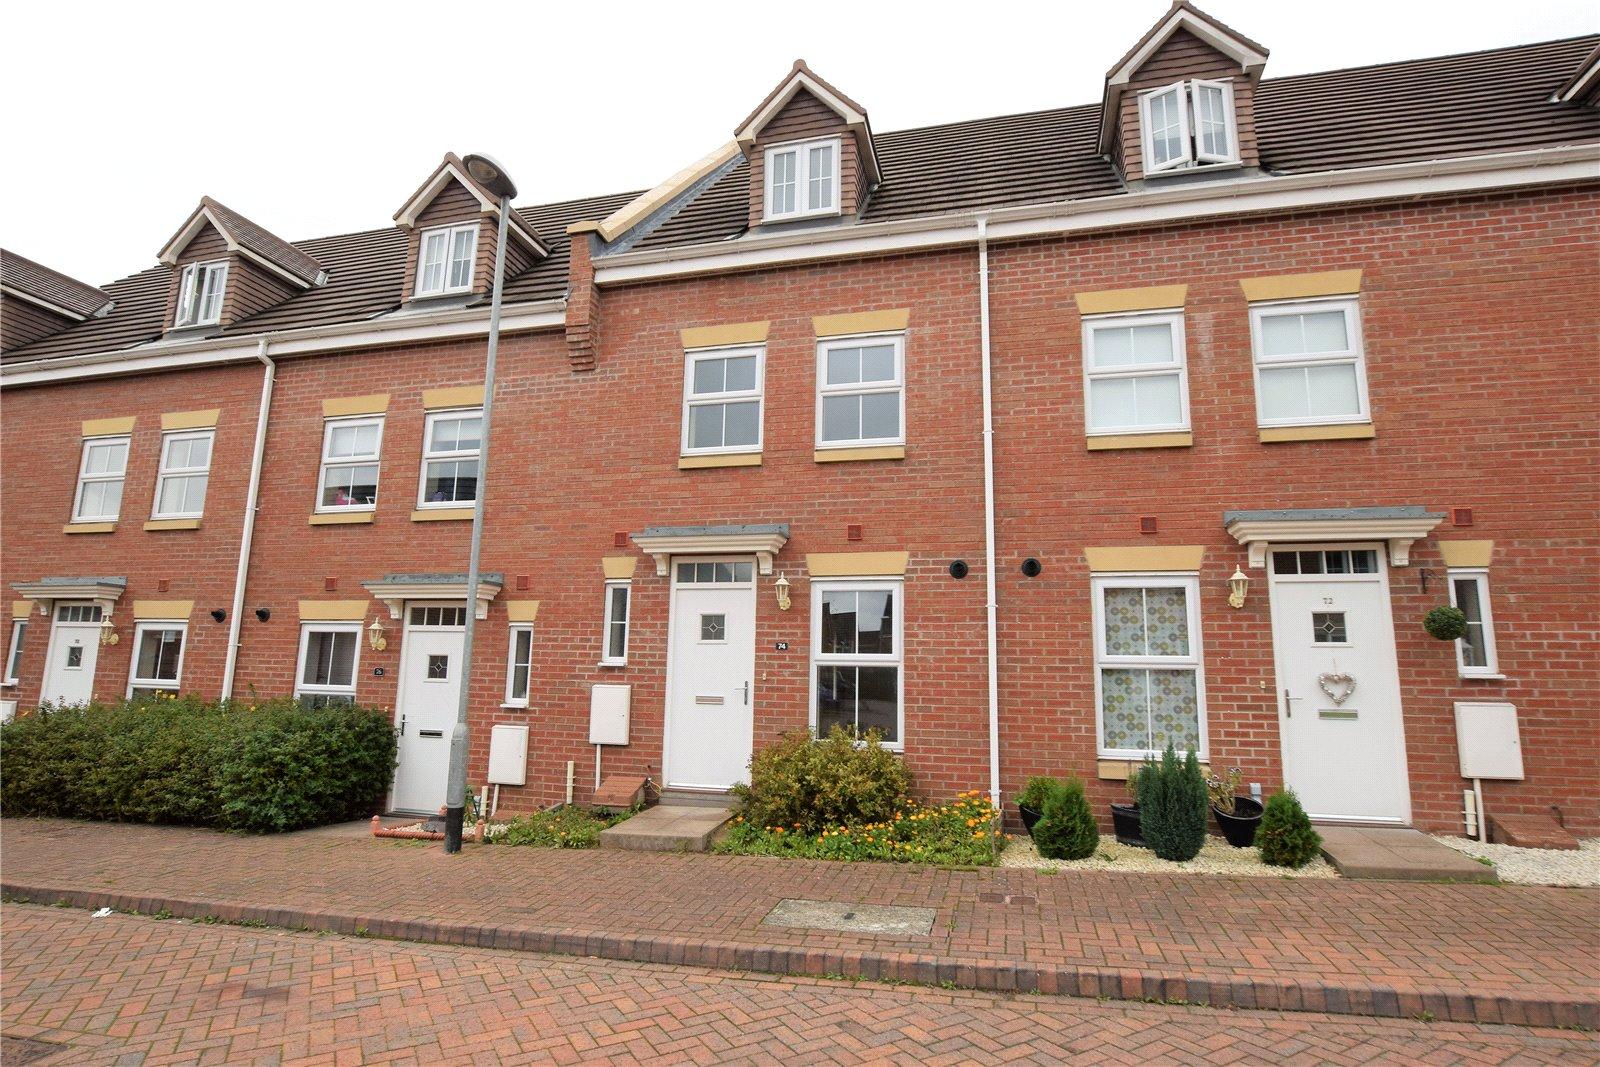 74 Highlander Drive, Donnington, Telford, Shropshire, TF2